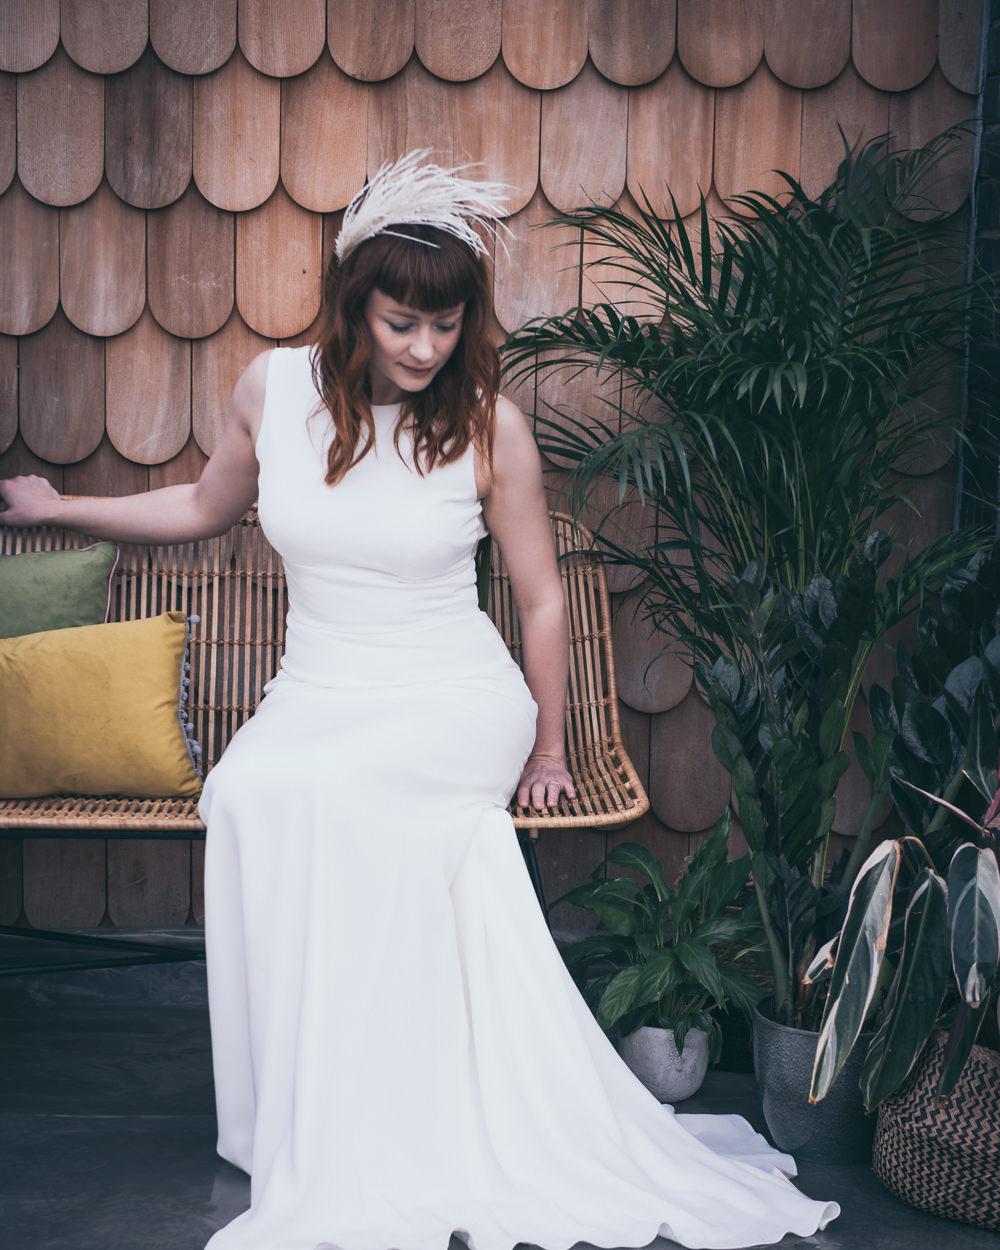 Bride Bridal Dress Gown Andrea Hawkes Bridal Sleek Fitted Modern Wedding Ideas Cat Arwel Photography